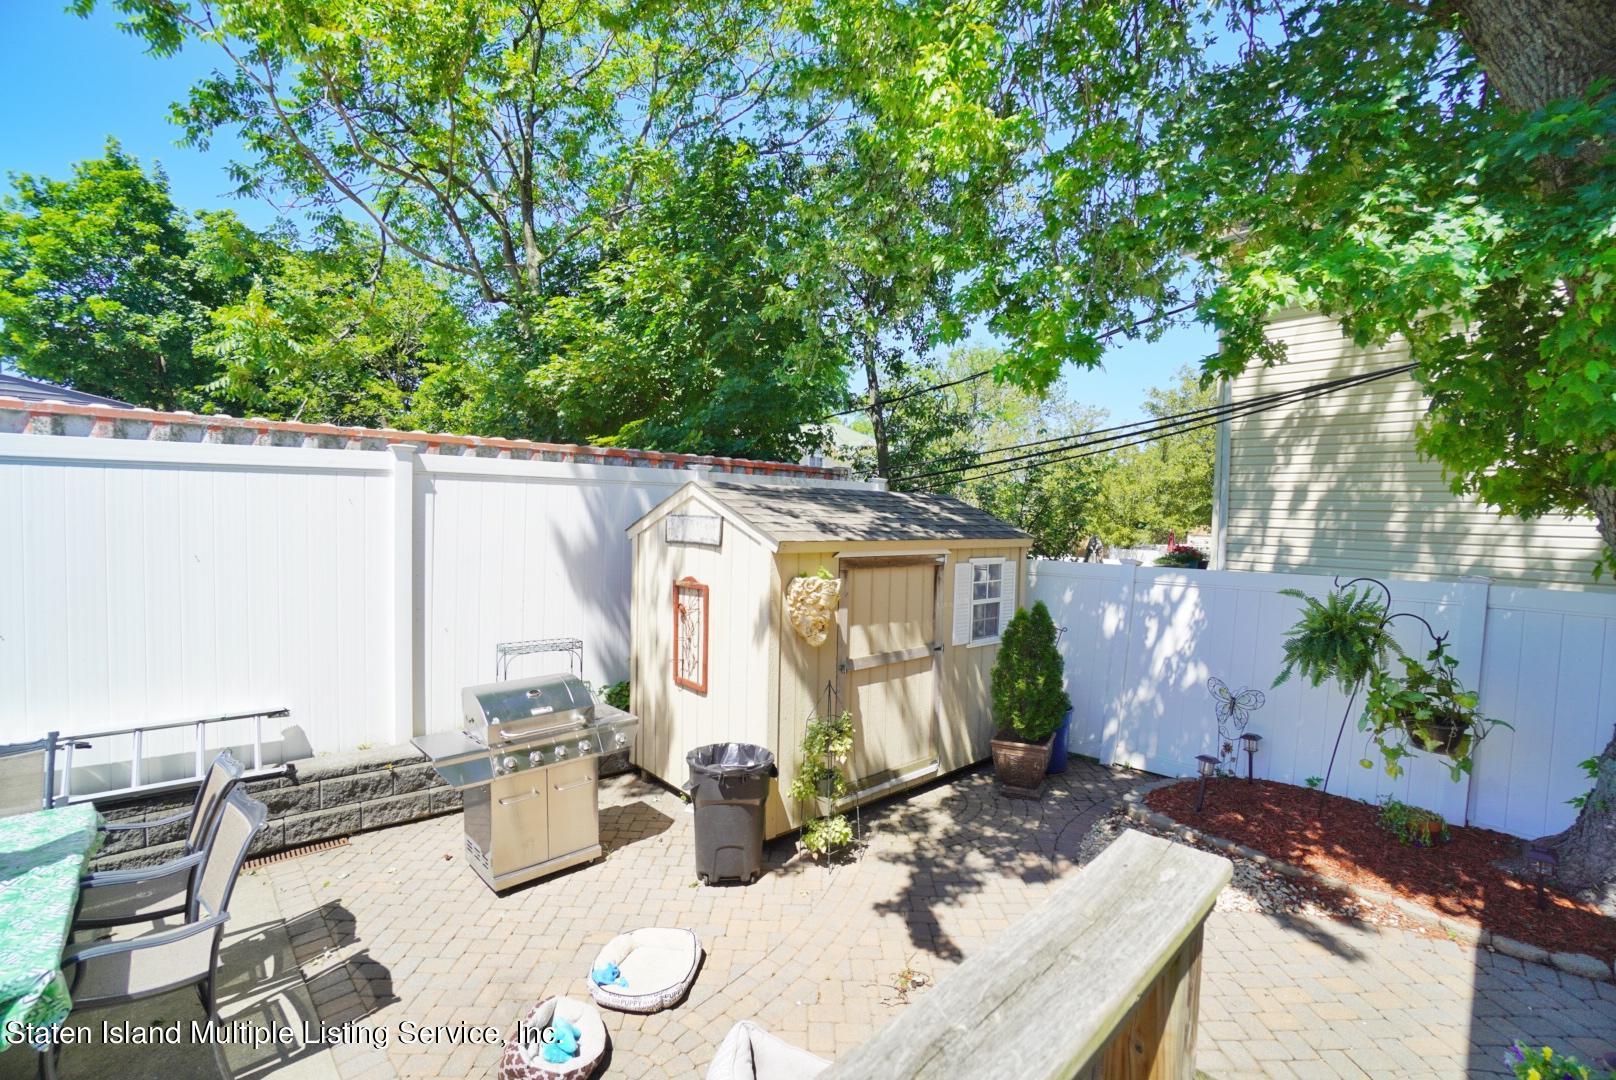 Single Family - Detached 264 Fisher Avenue  Staten Island, NY 10307, MLS-1146898-44